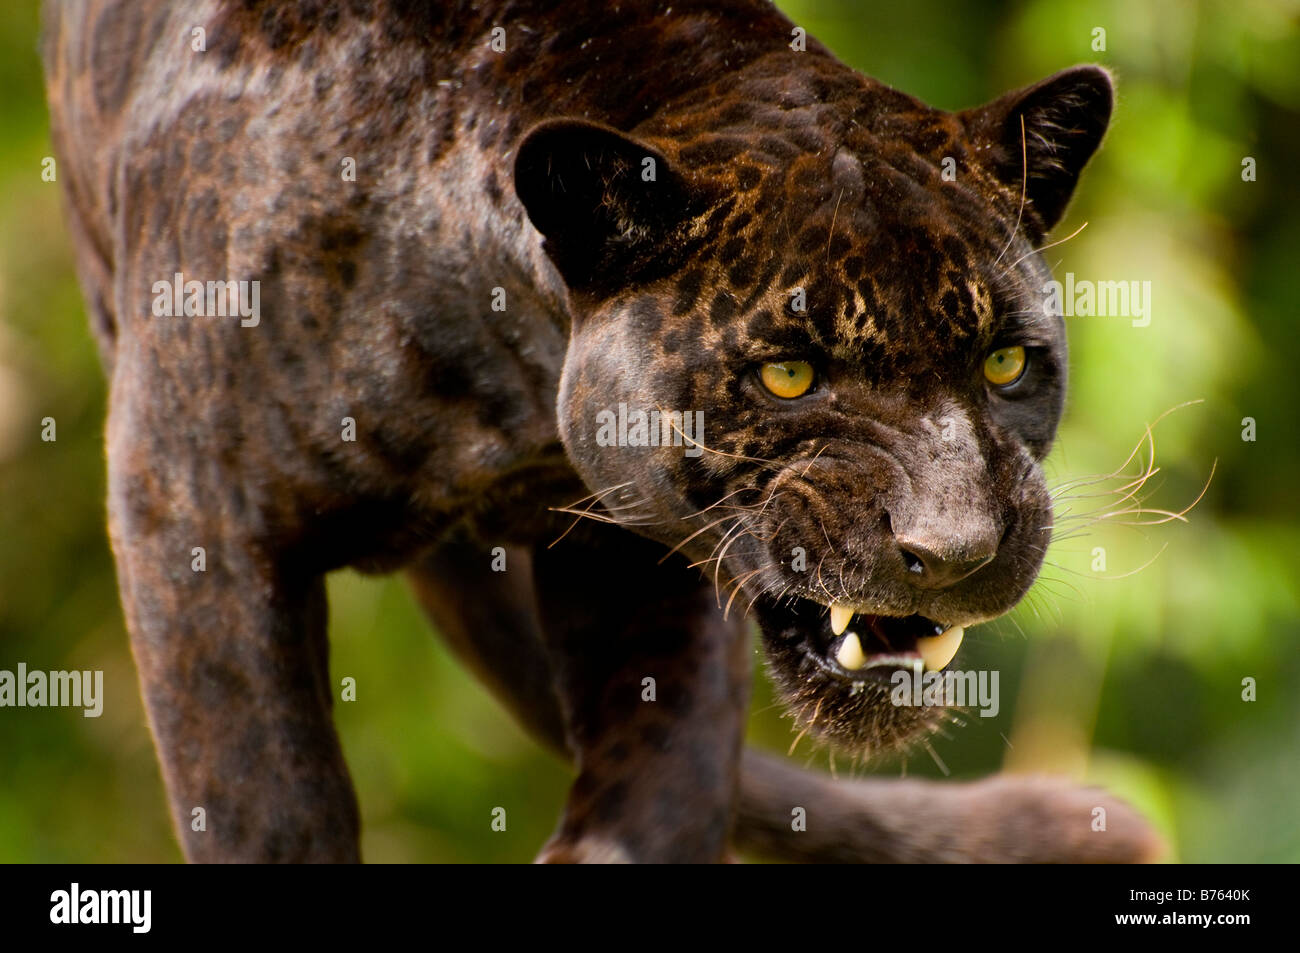 Panther o Giaguaro Nero Panthera onca Immagini Stock